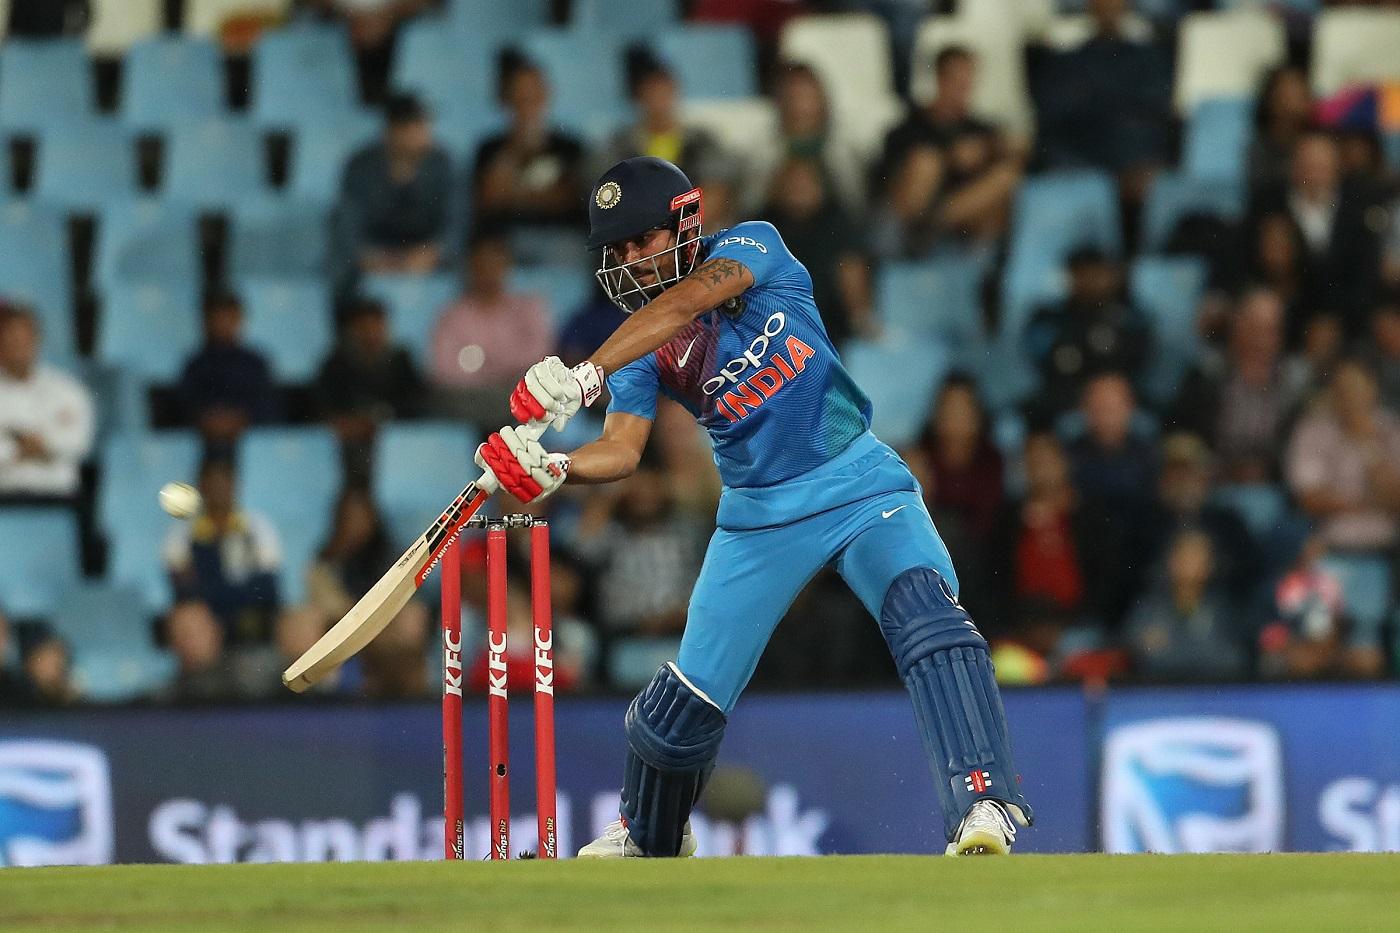 India Rest Virat Kohli For Asia Cup 2018, Recall Ambati Rayudu